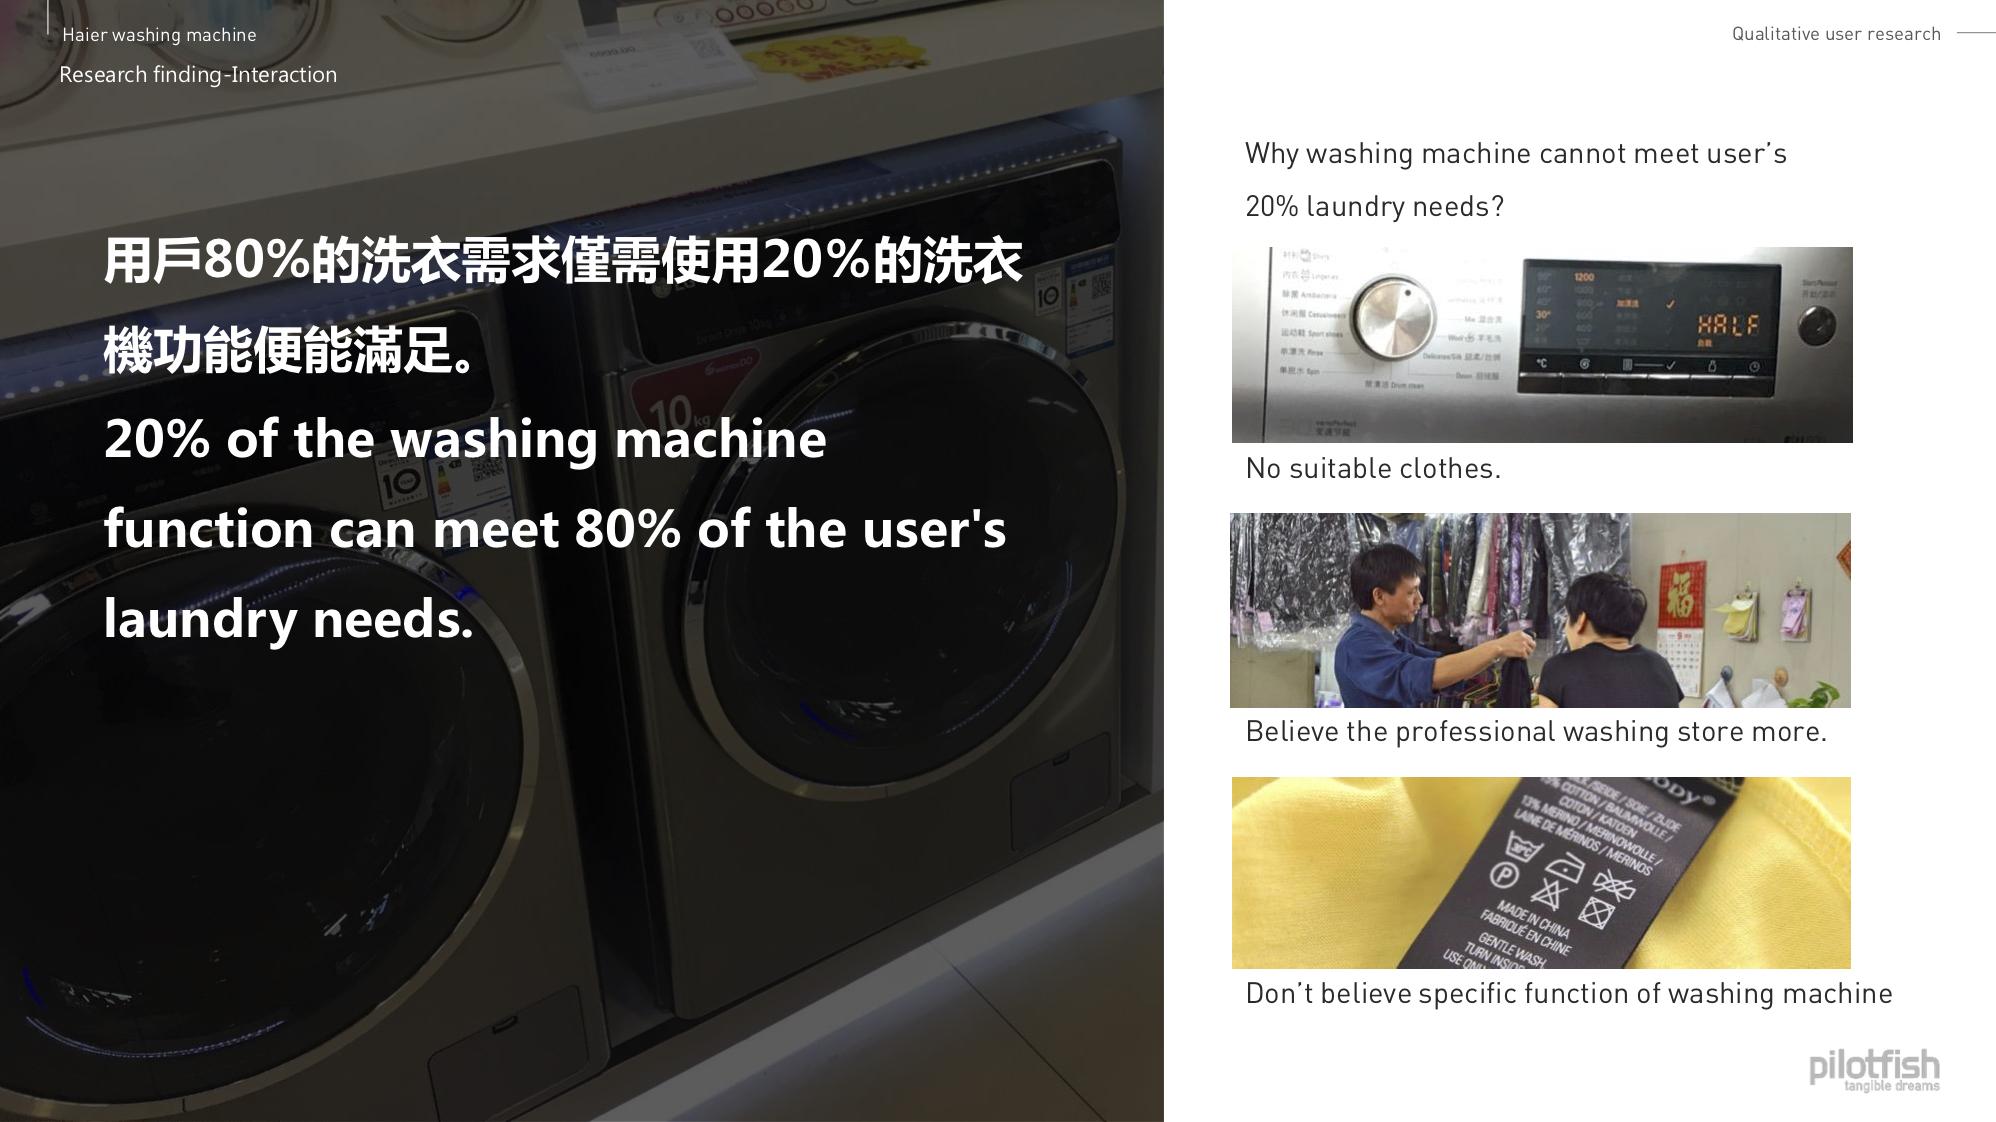 20170727_Haier_washing machine innovative UI_P0 presentation_V4_Eng_26.jpg